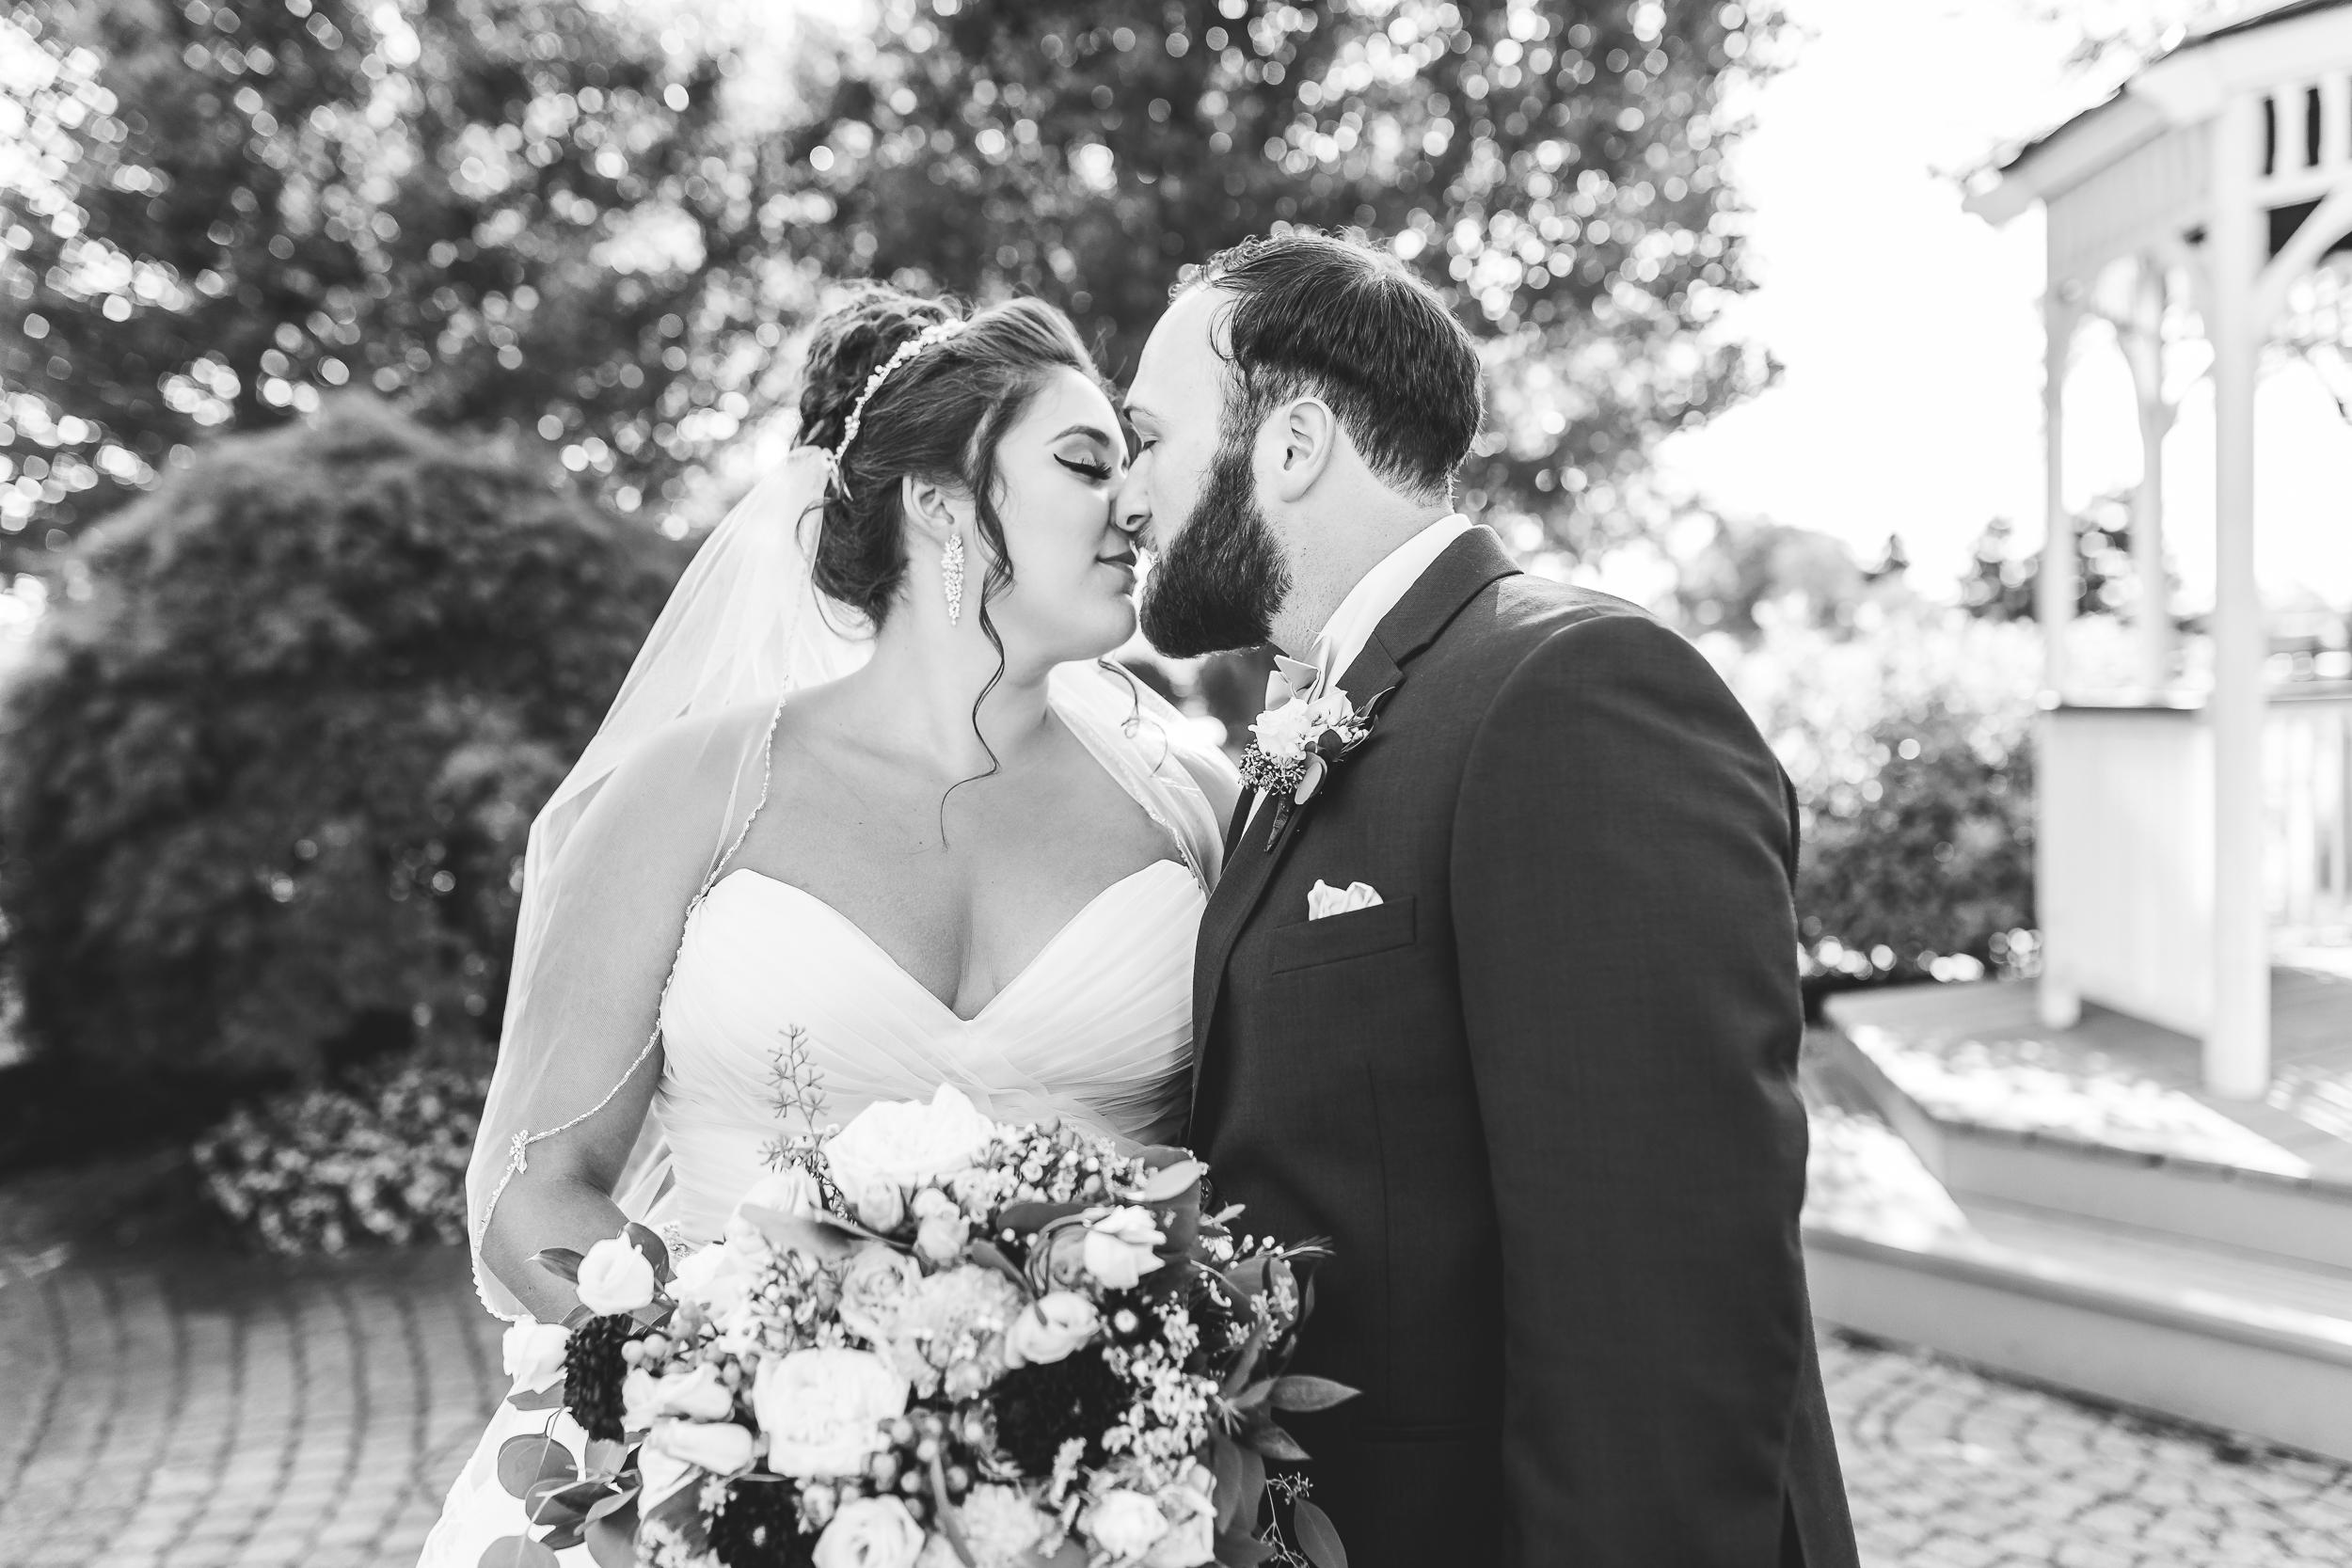 kandra-lynn-photography-laurel-manor-wedding-61